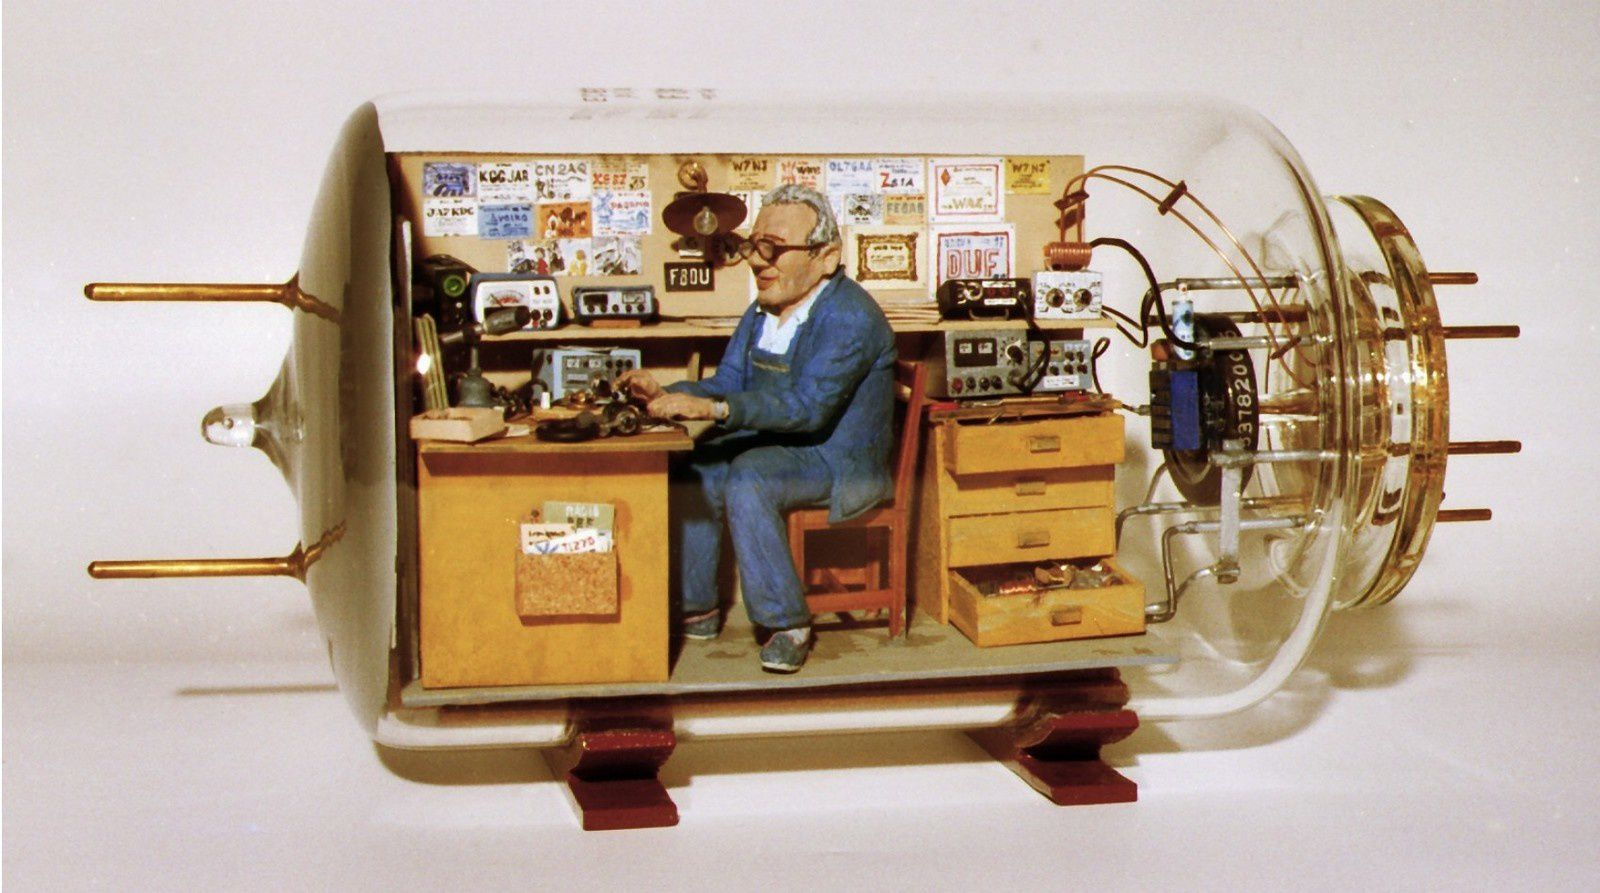 http://img.over-blog-kiwi.com/0/96/38/04/20140314/ob_ceed71_f8du-edmond-aubry-radio-amateur-en-1989.jpg